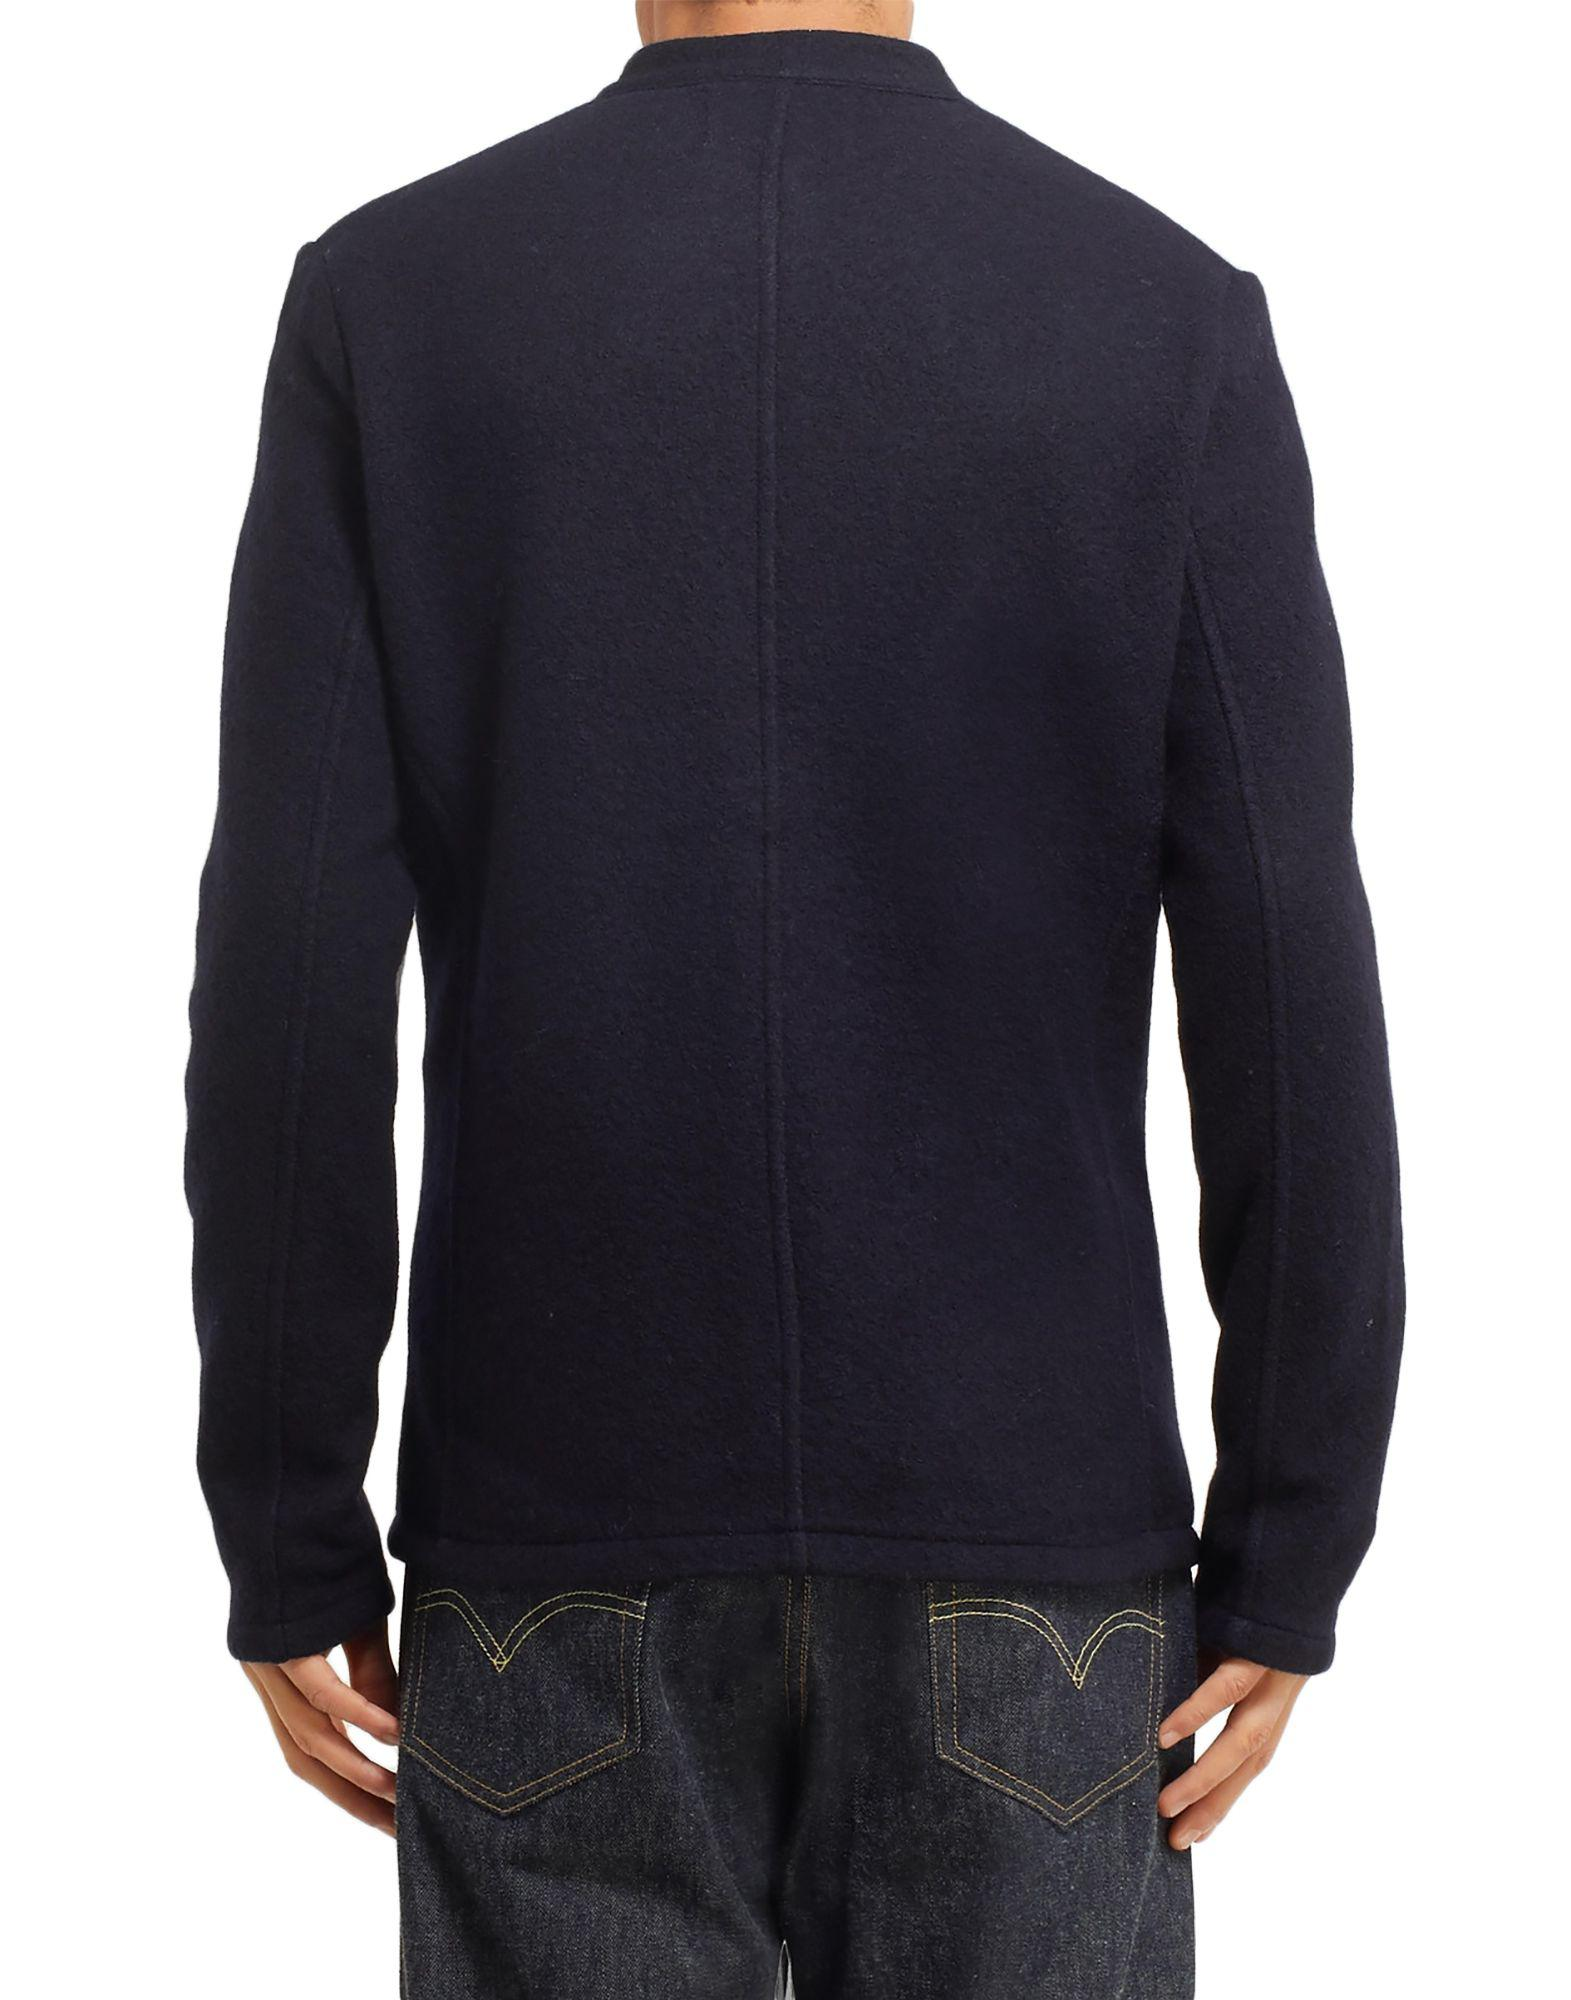 NN07 Wool Blazer in Navy (Blue) for Men